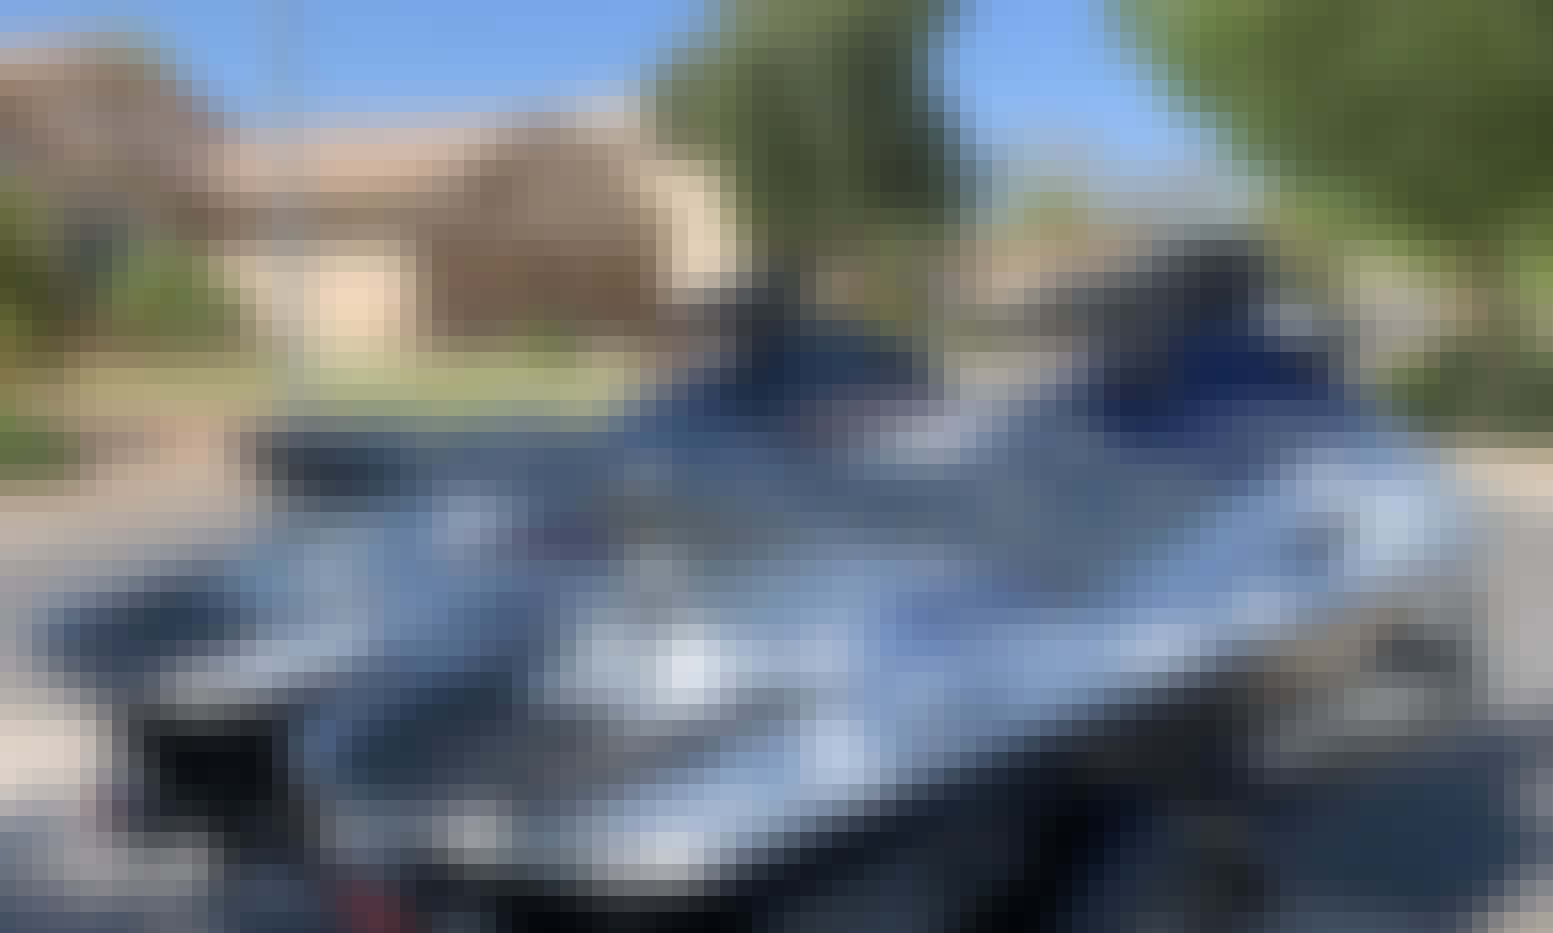 2 Yamaha Waverunner VX Sport Jetskis Rental in Phoenix, Arizona